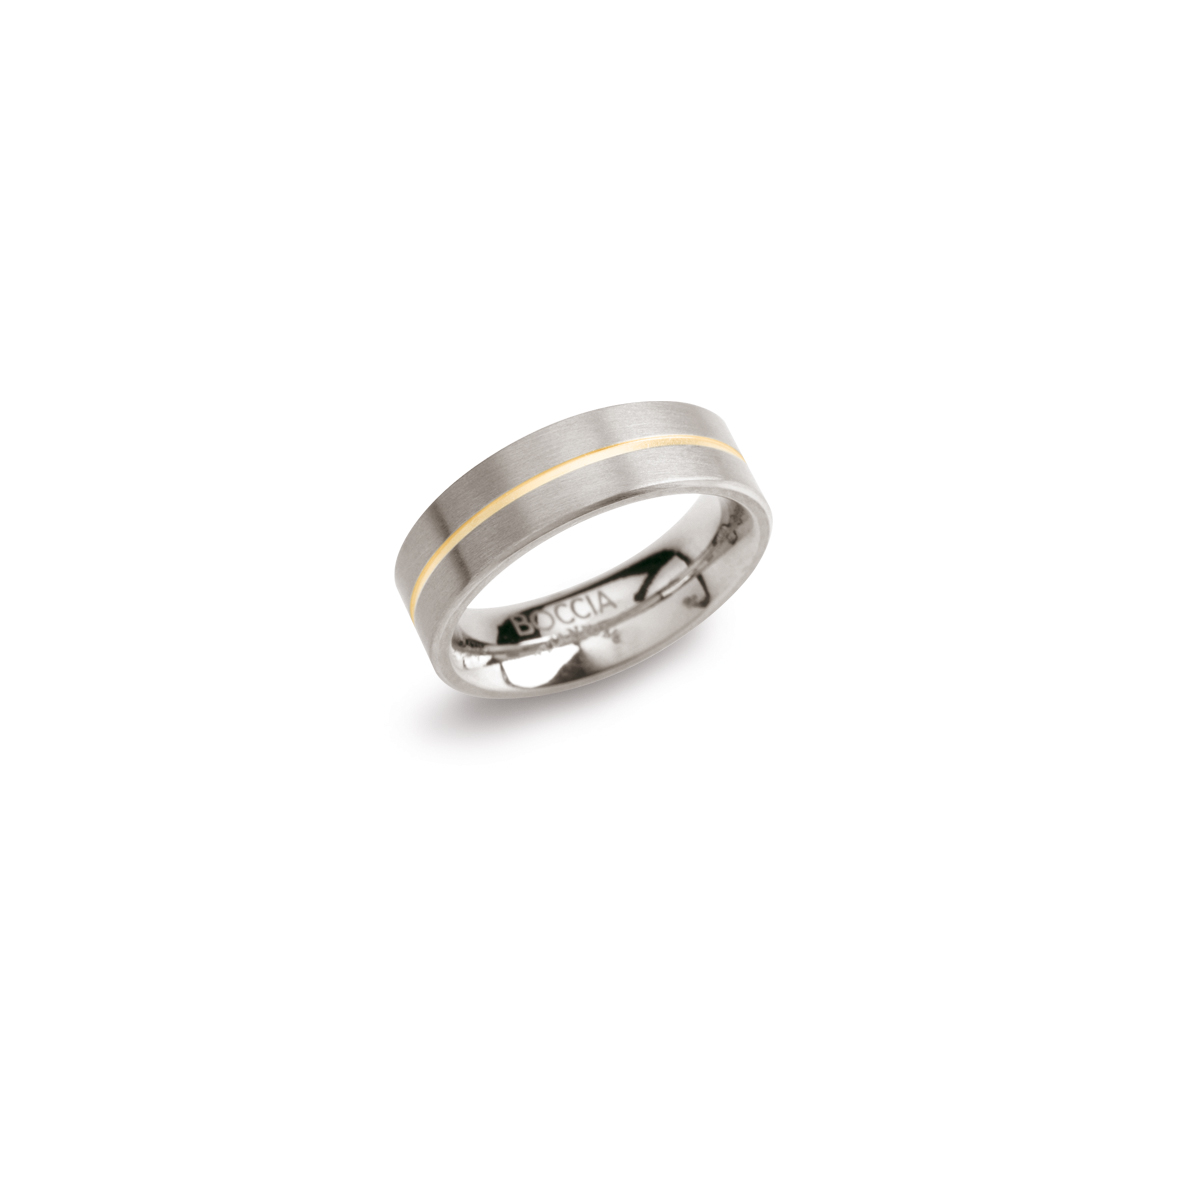 Boccia 0101-03 Ring Titanium zilver- en goudkleurig 6 mm Maat 62